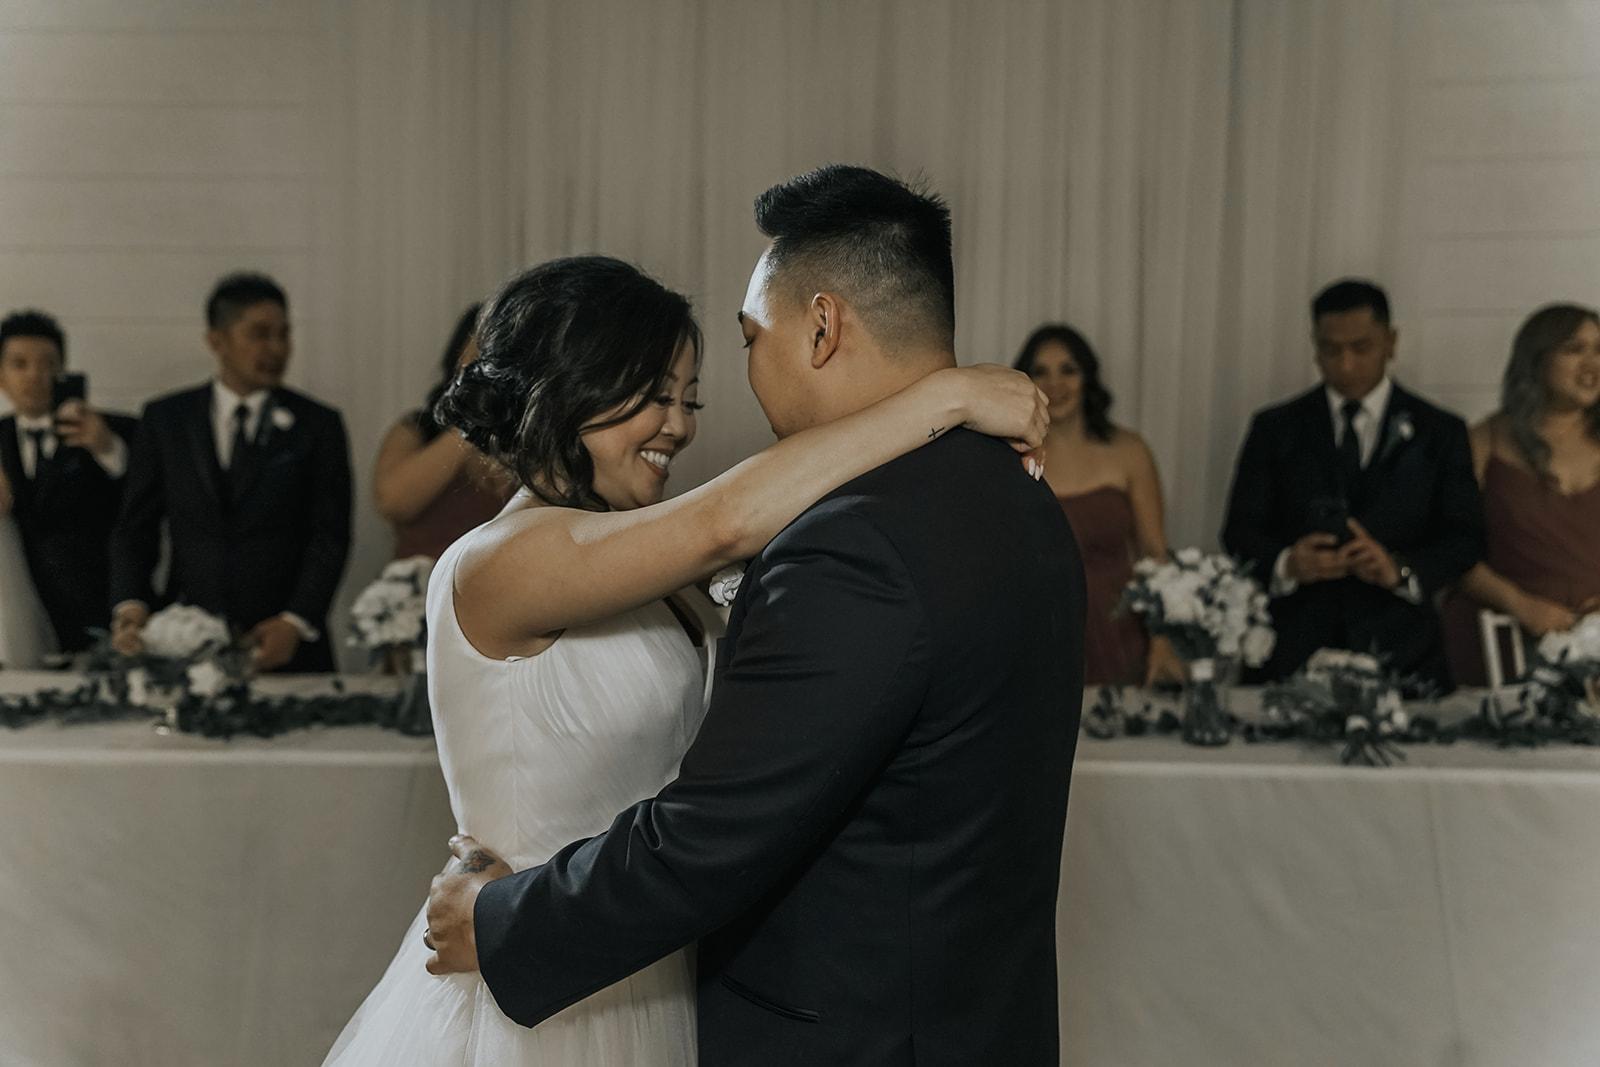 Bixby Tulsa White Barn Wedding Venues 19a.jpg